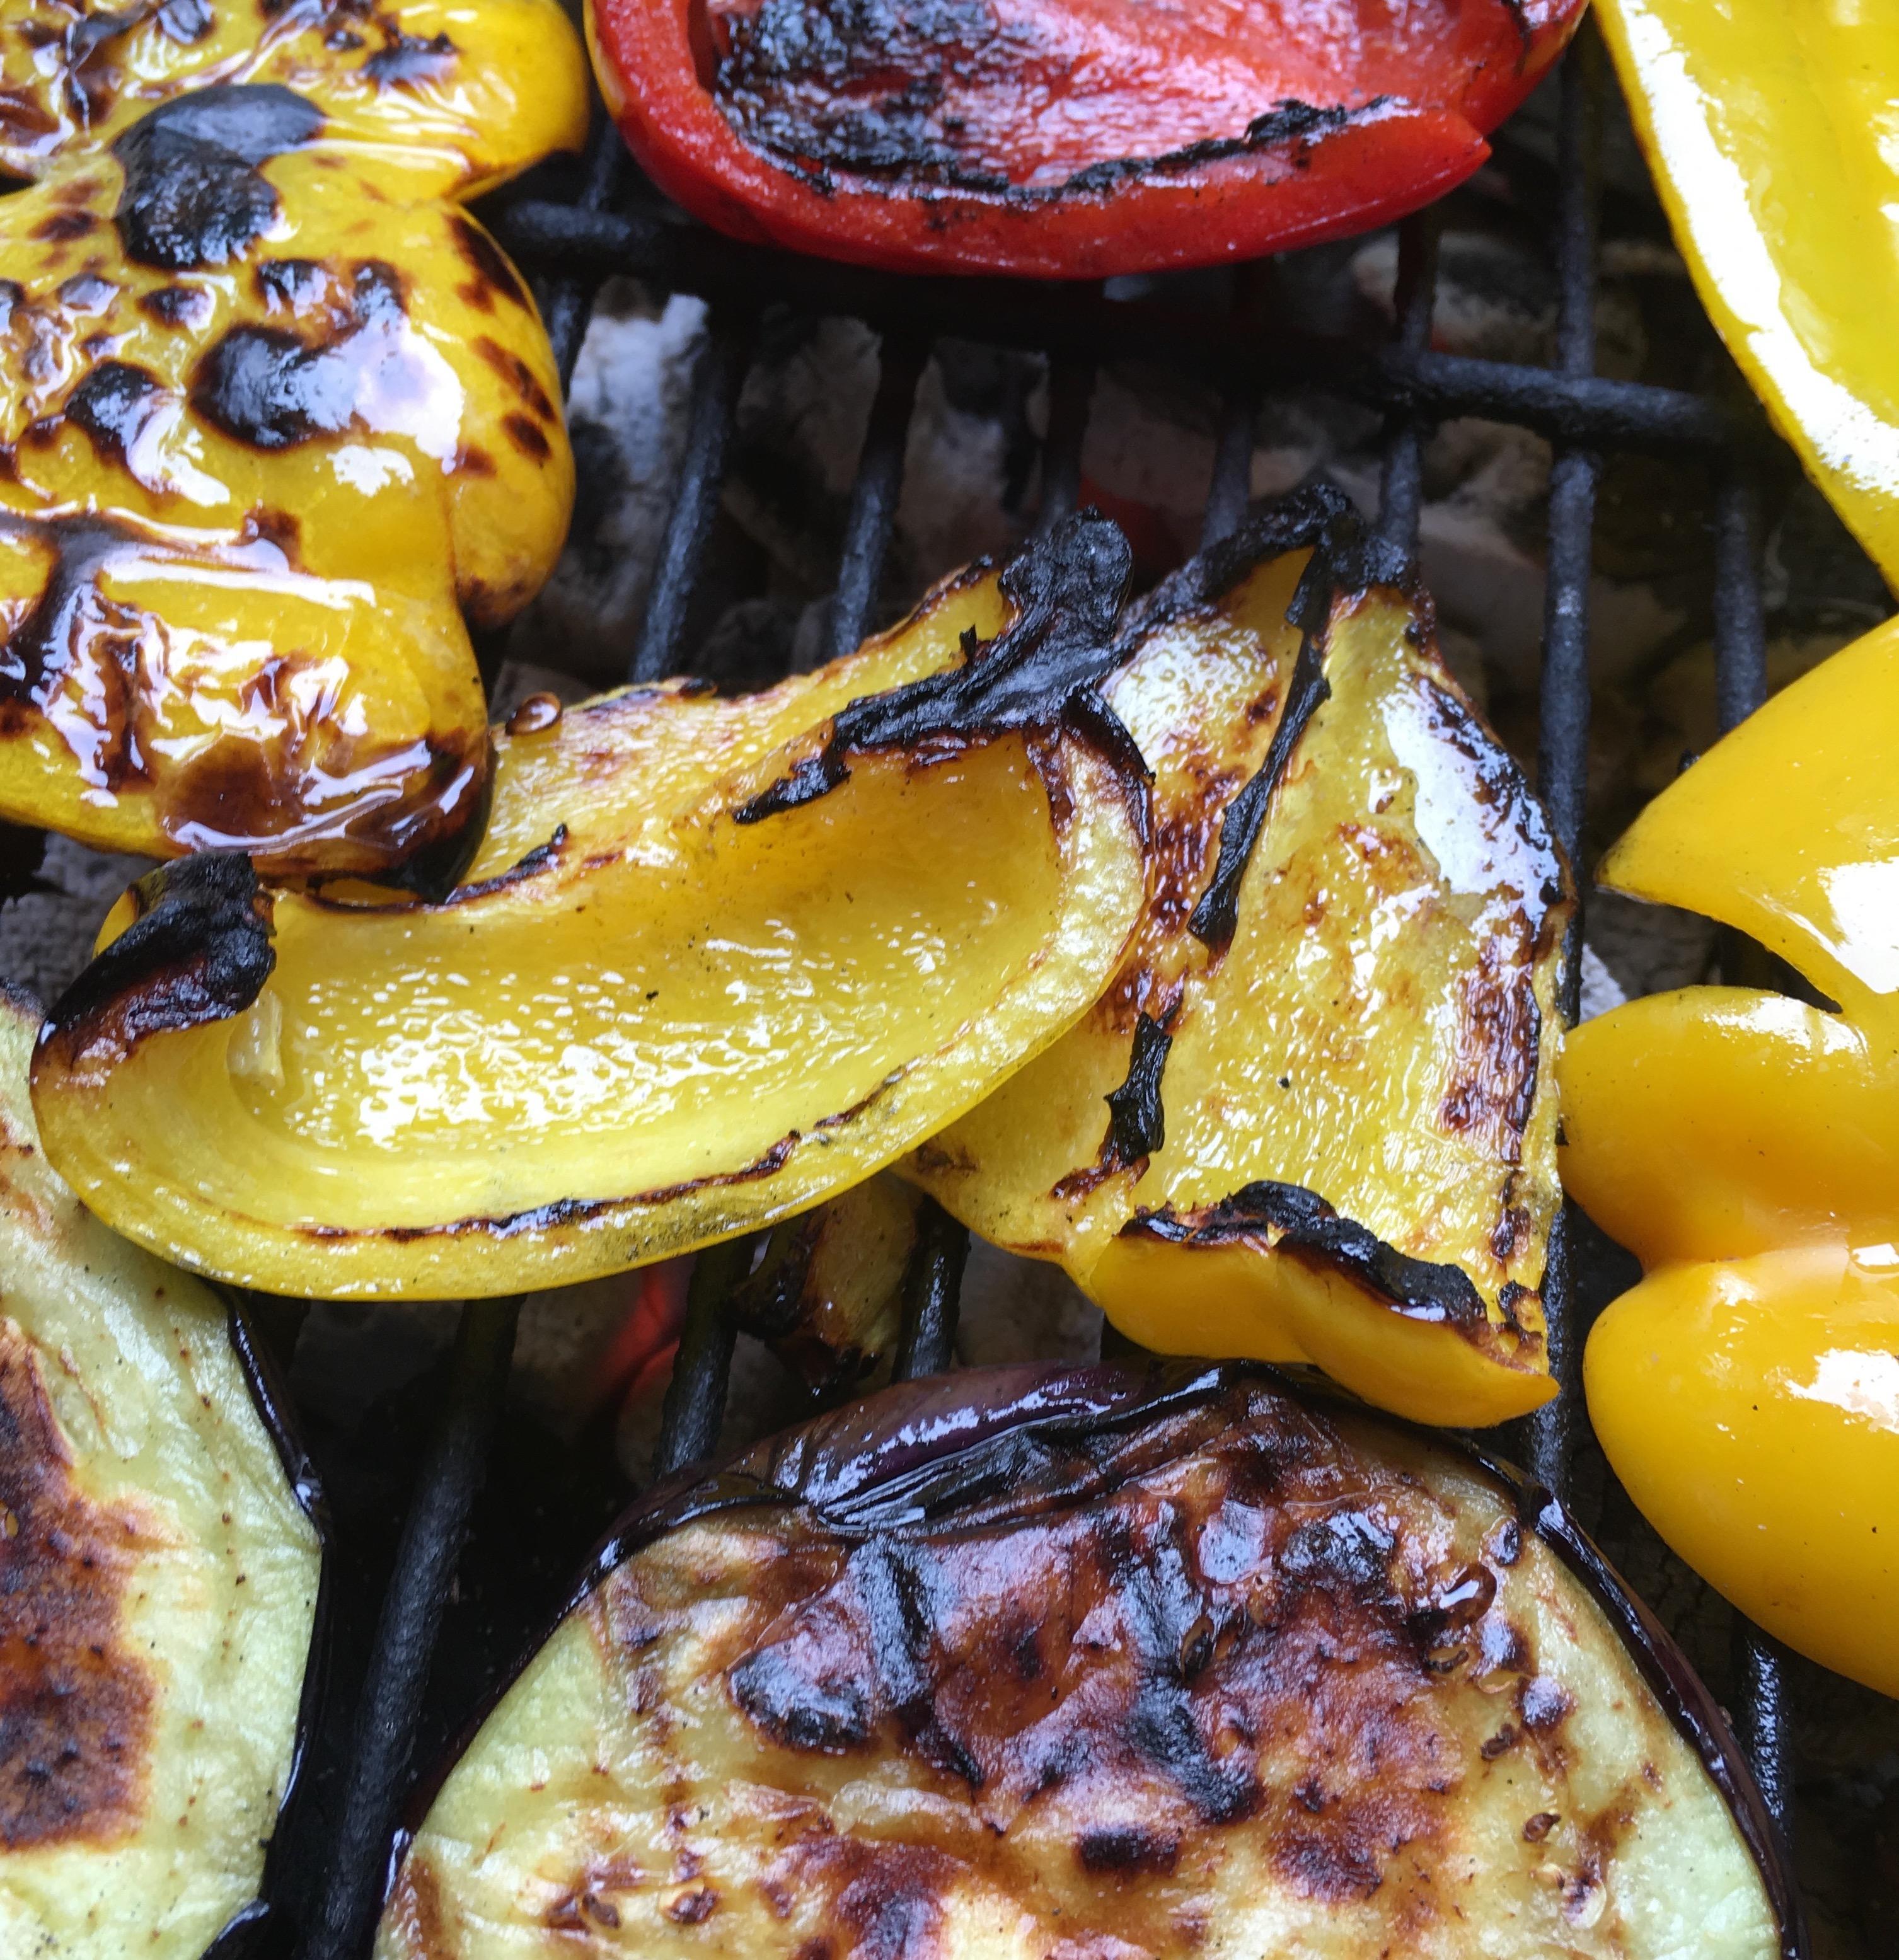 BBQ using charcoal